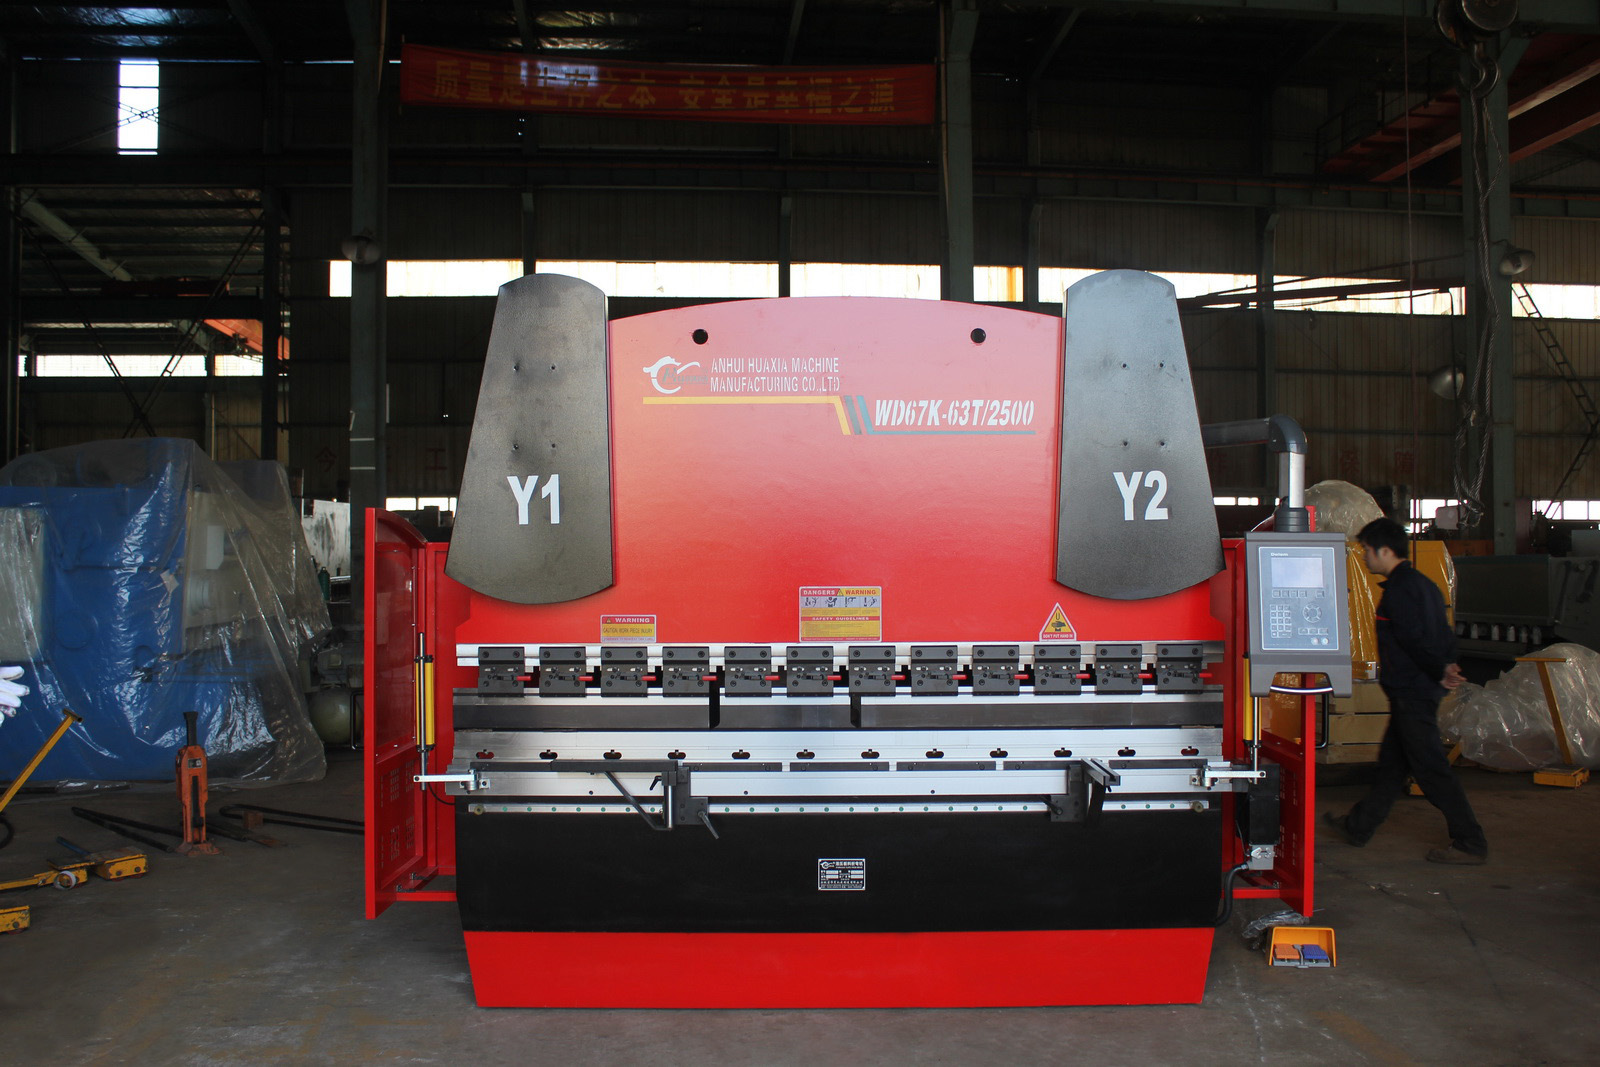 Wd67k 63t/2500 Electrohydraulic Servo Press Brake, Bending Machine with CNC Controller